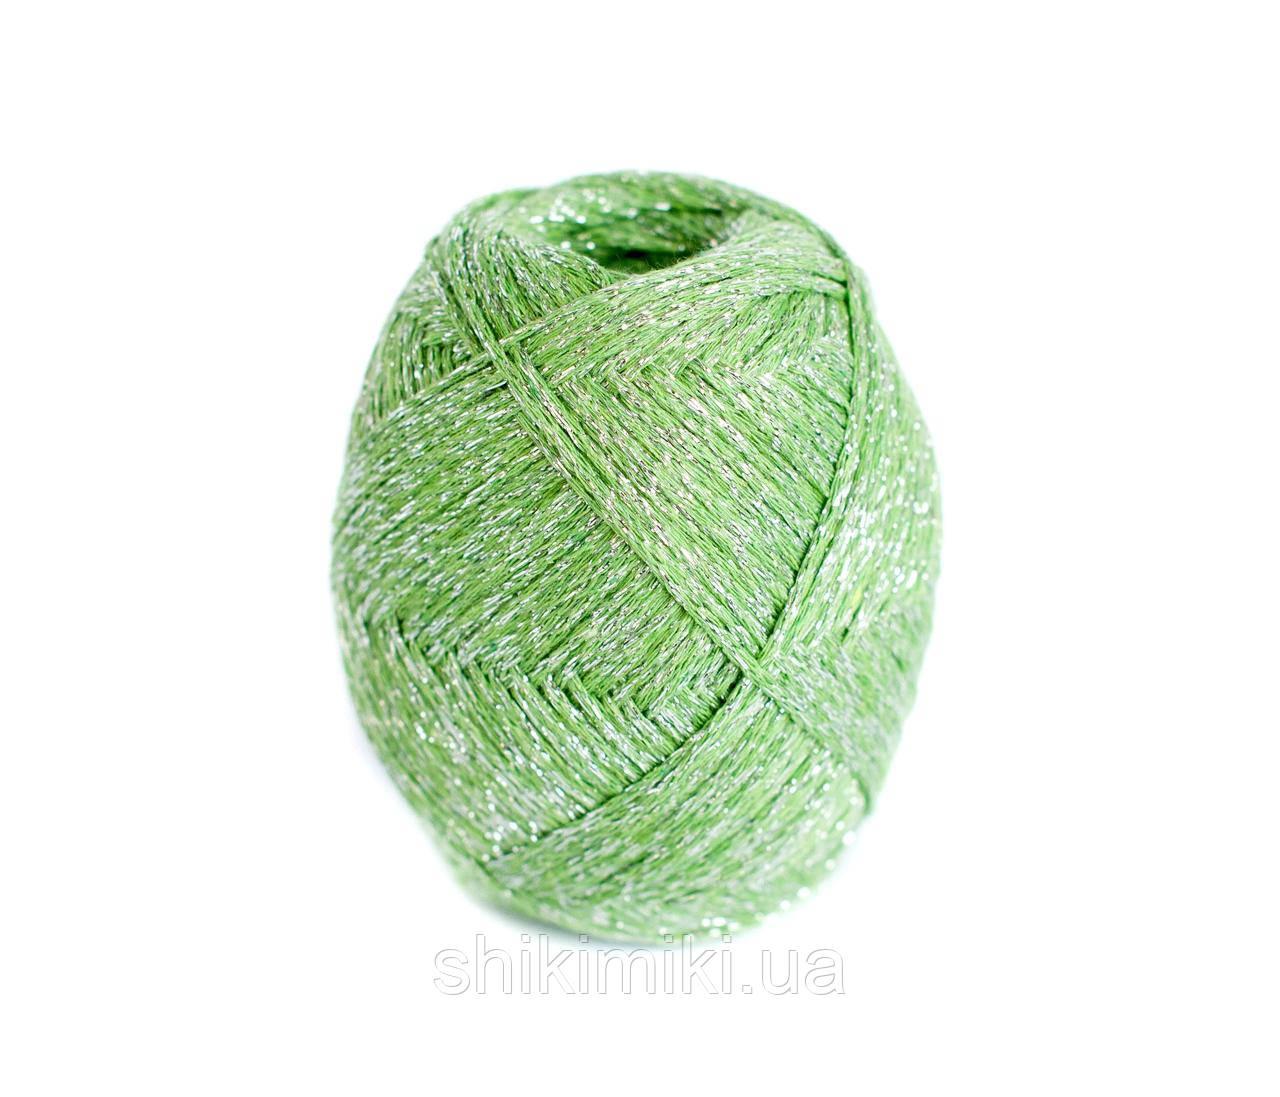 Трикотажный шнур Knit&Shine, цвет фисташковый